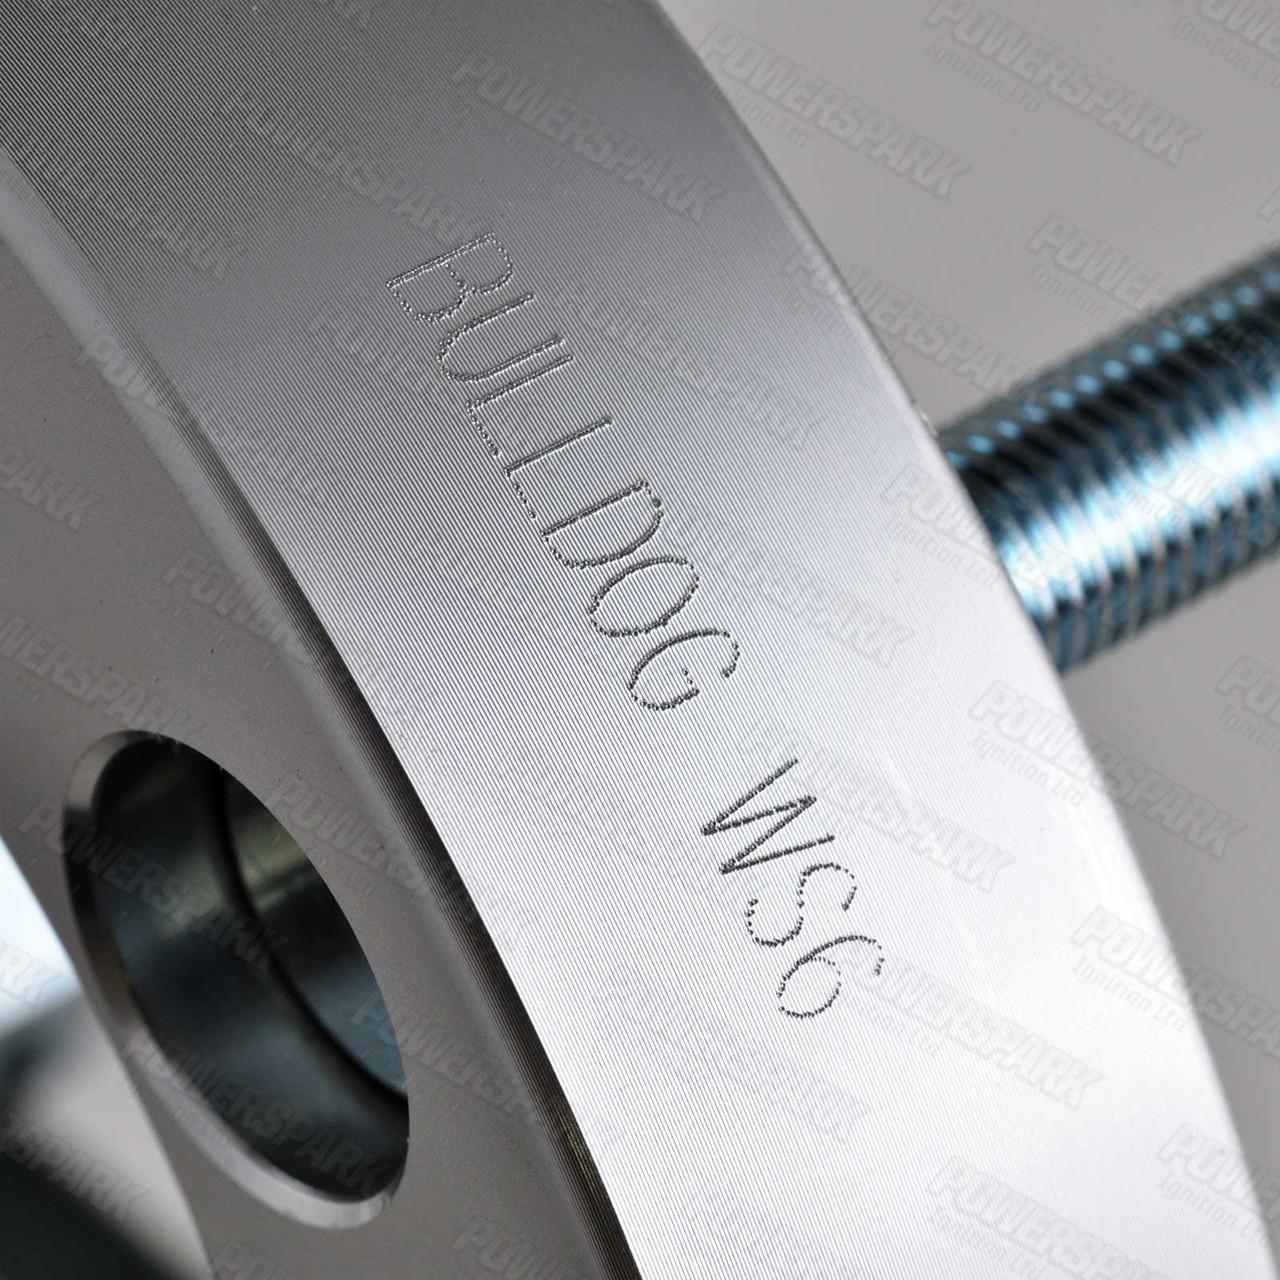 Single Bulldog 30mm Wheel Spacer To Fit 6 Stud Toyota, Mitsubishi, Isuzu, Ford, Vauxhall 4x4 Vehicles